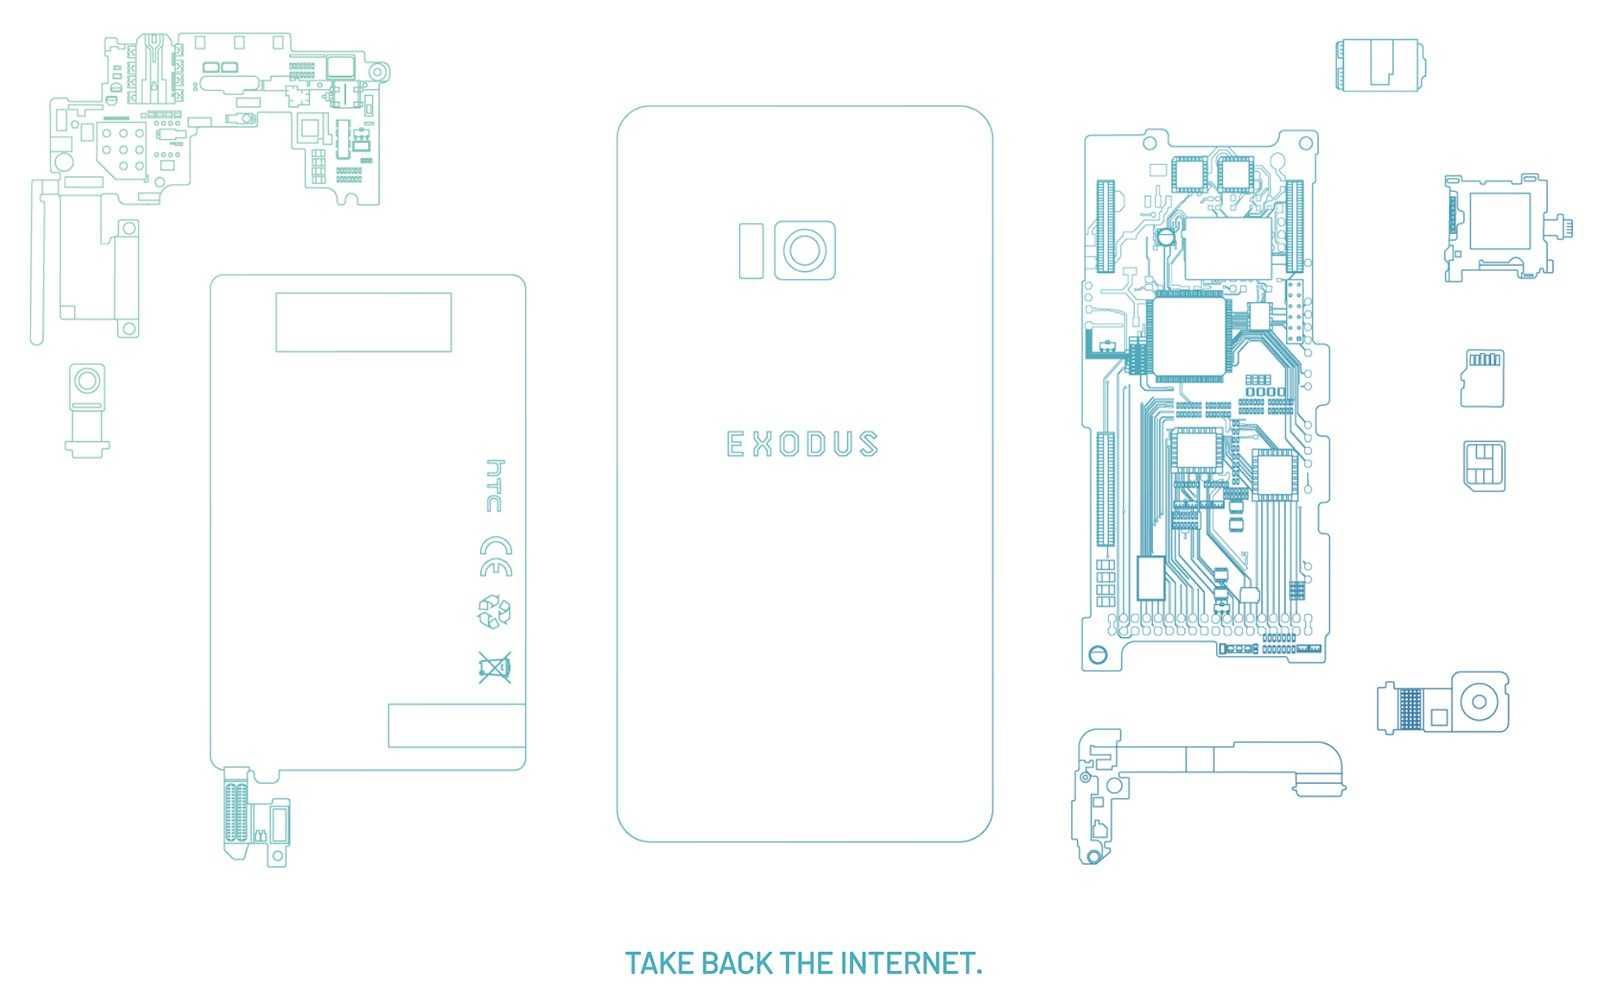 Новинка: смартфон для криптодержателей HTC Exodus